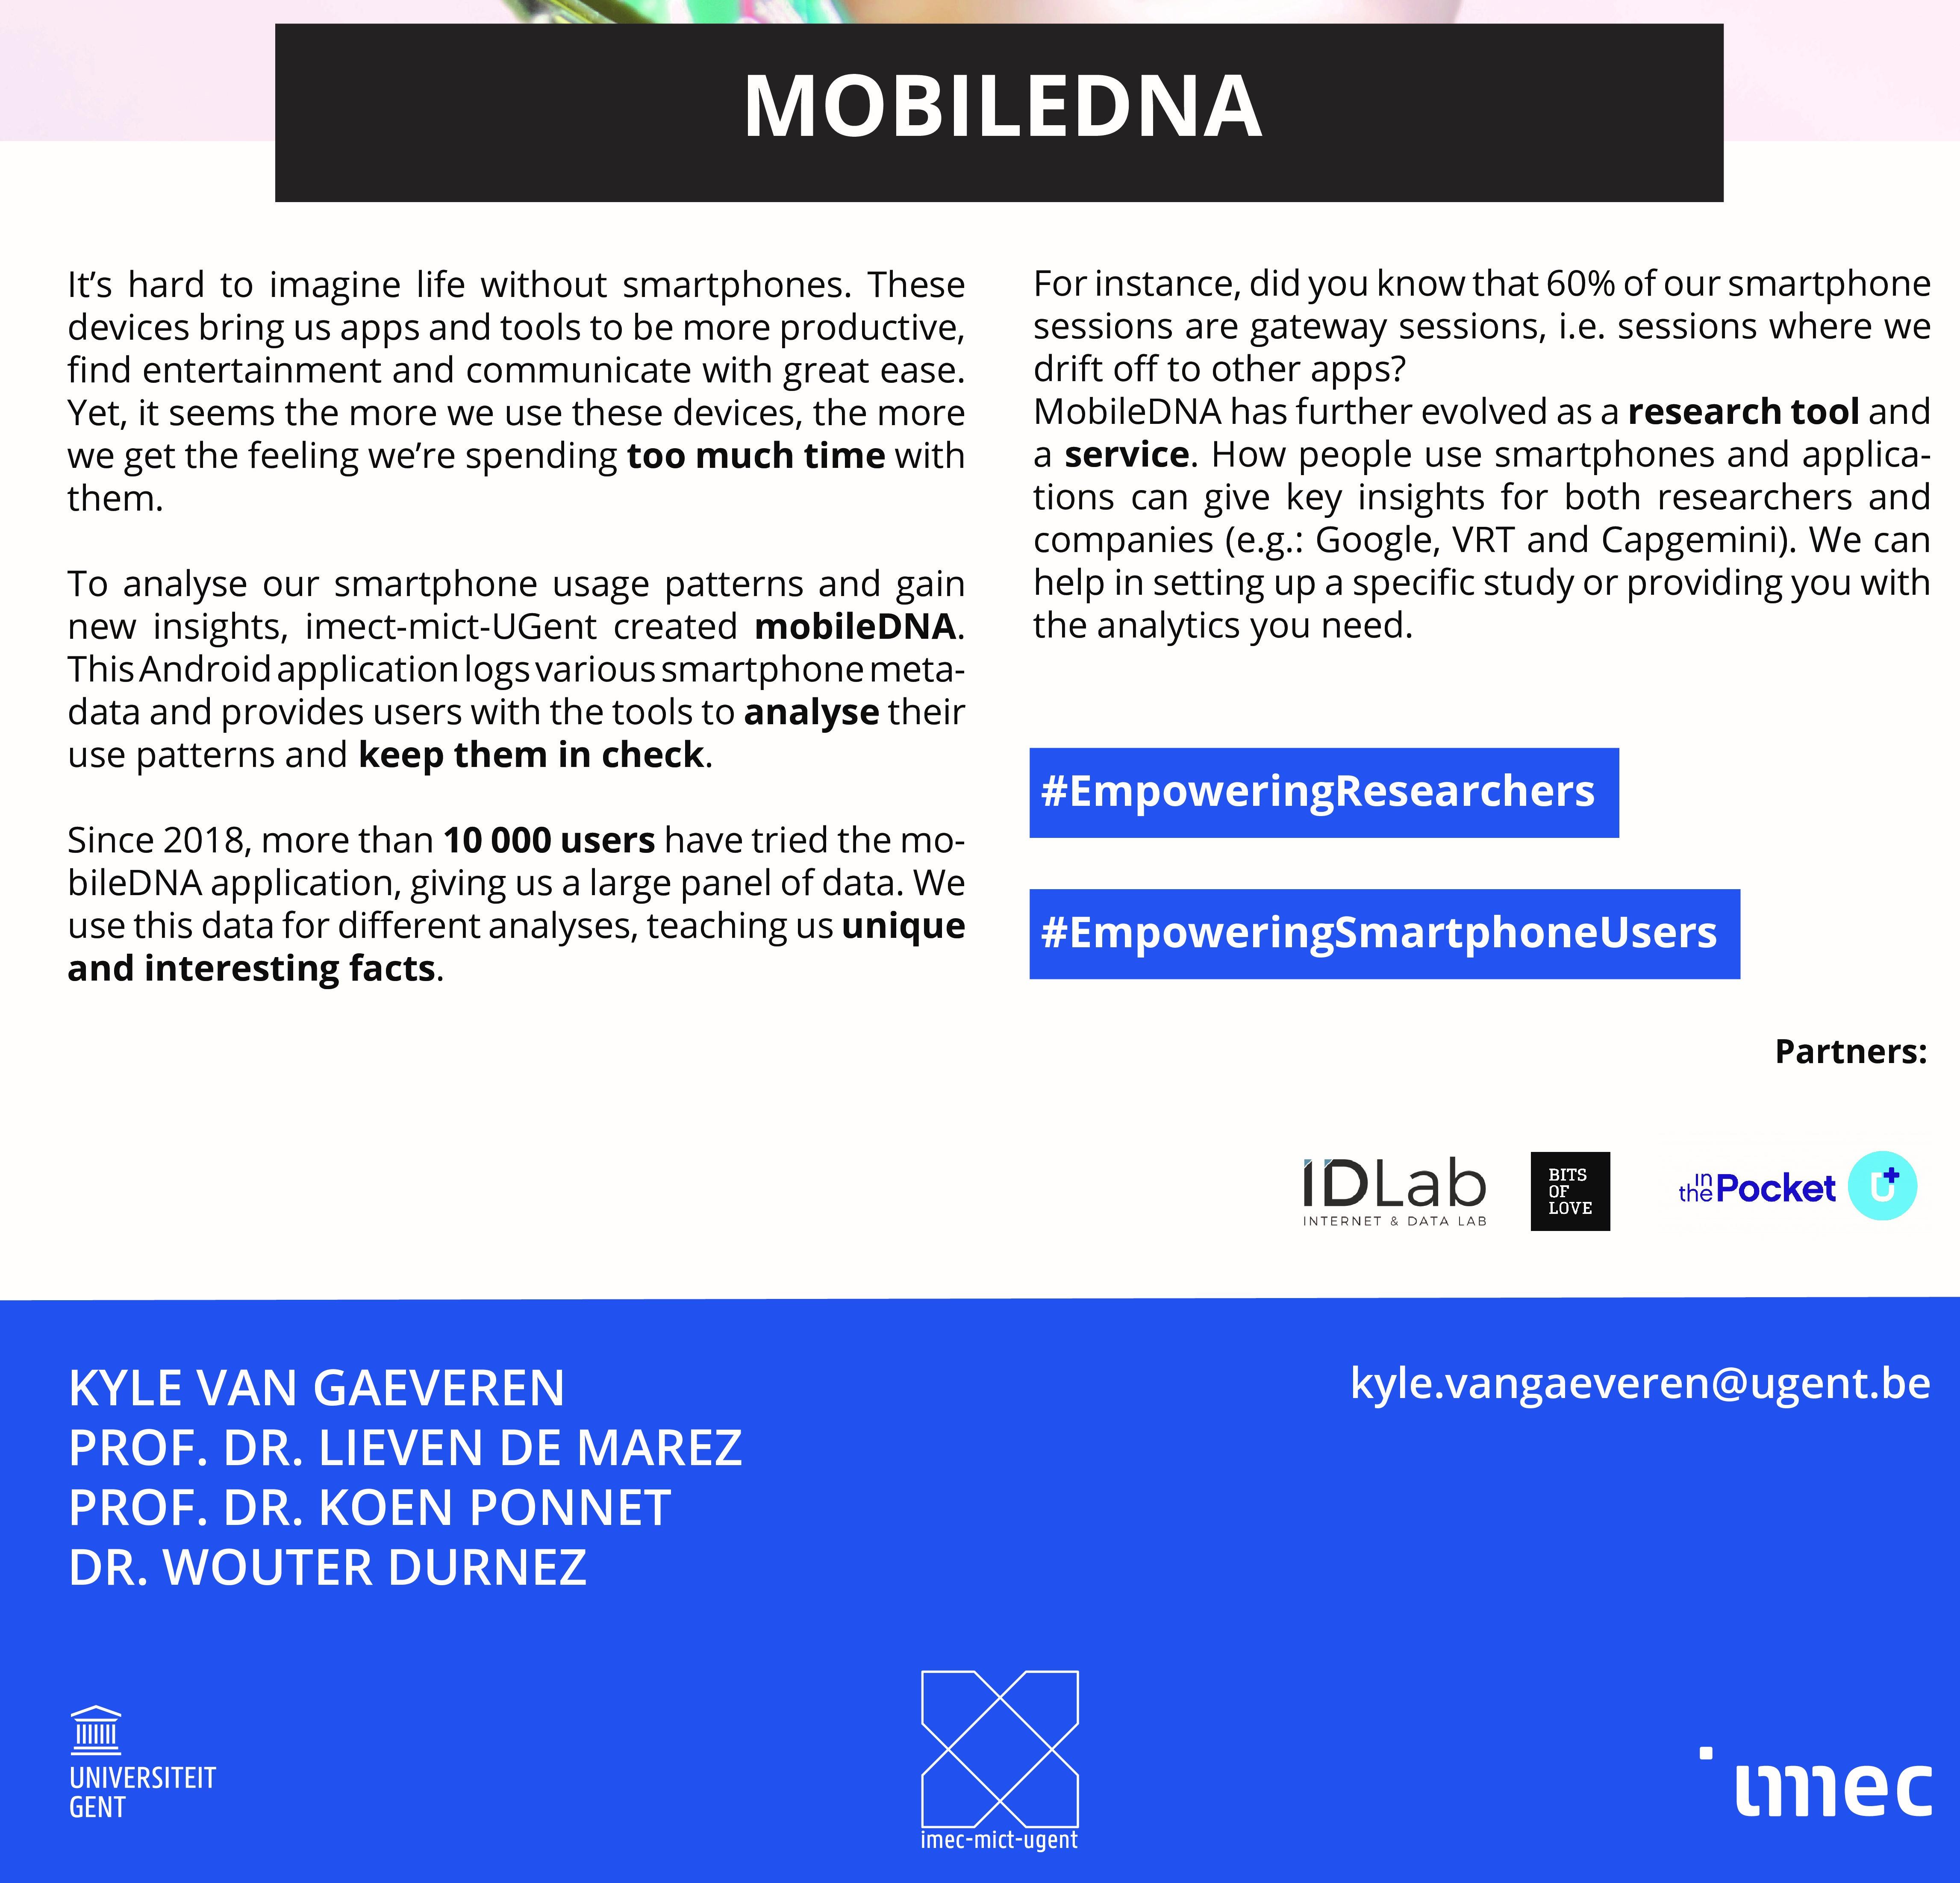 mobiledna nominated